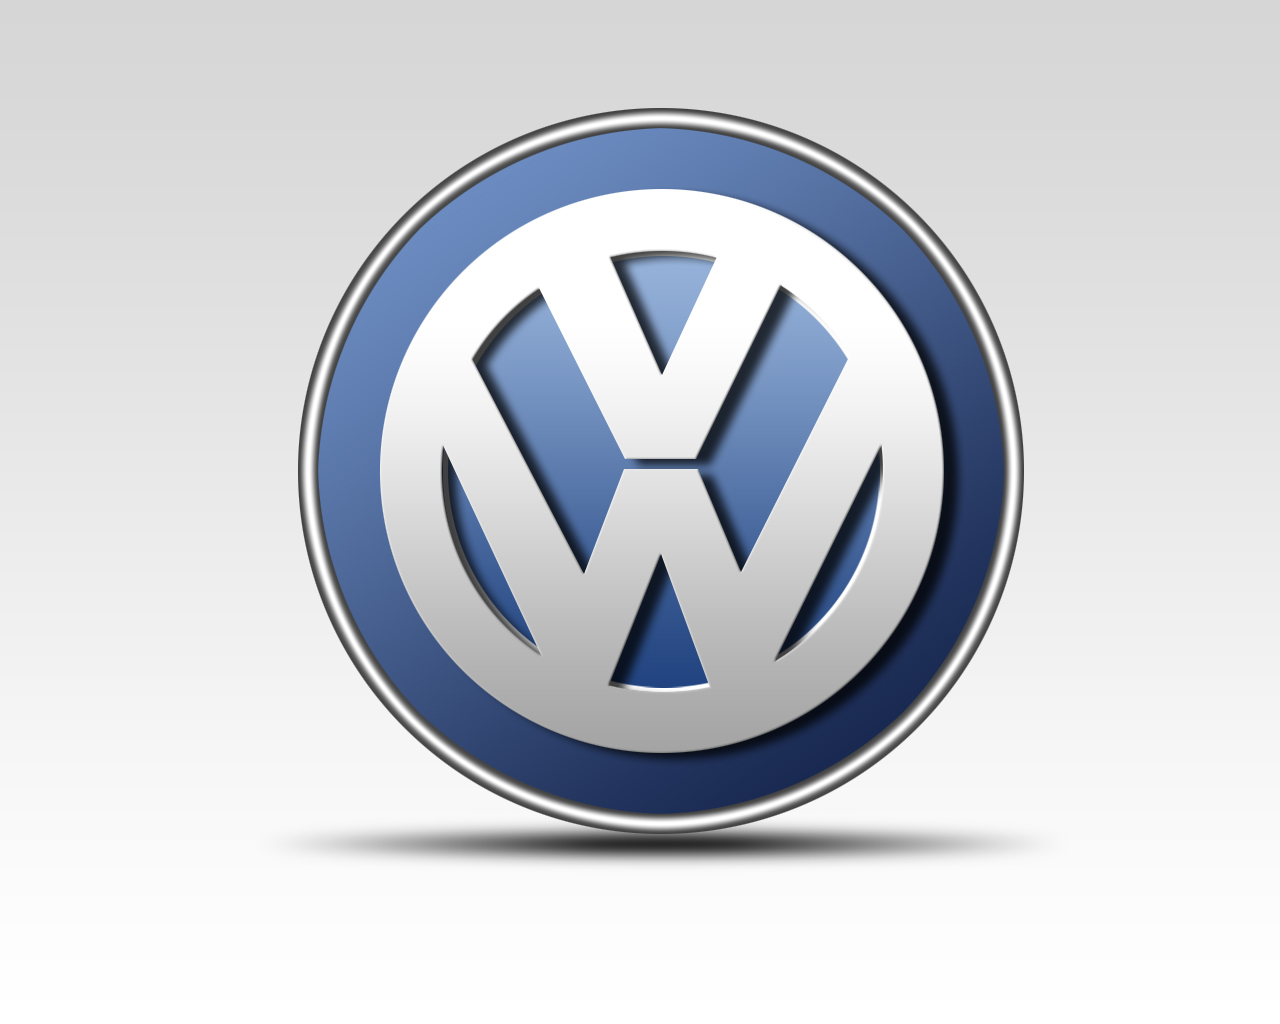 volkswagen logo full volkswagen logo volkswagen logo volkswagen logo 1280x1024